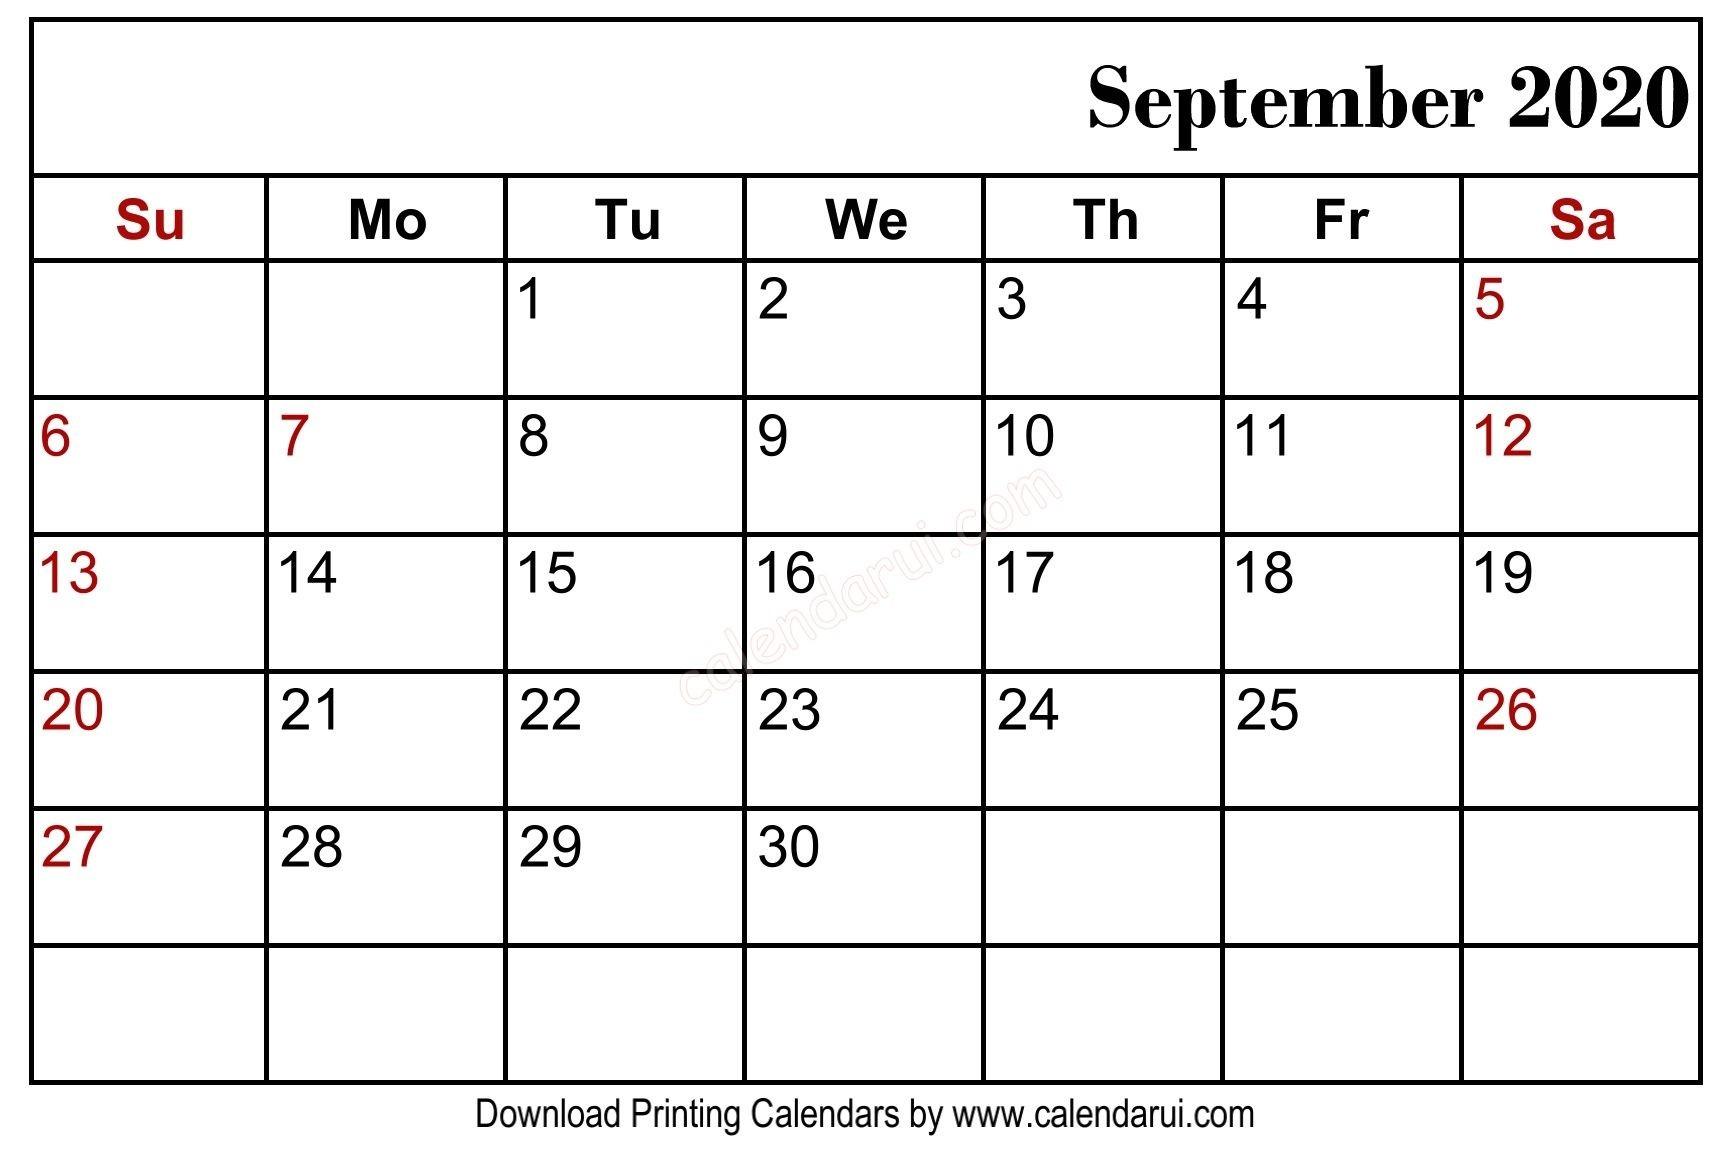 September 2020 Blank Calendar Printable Free Download  September 2020 Calendar Malayalam